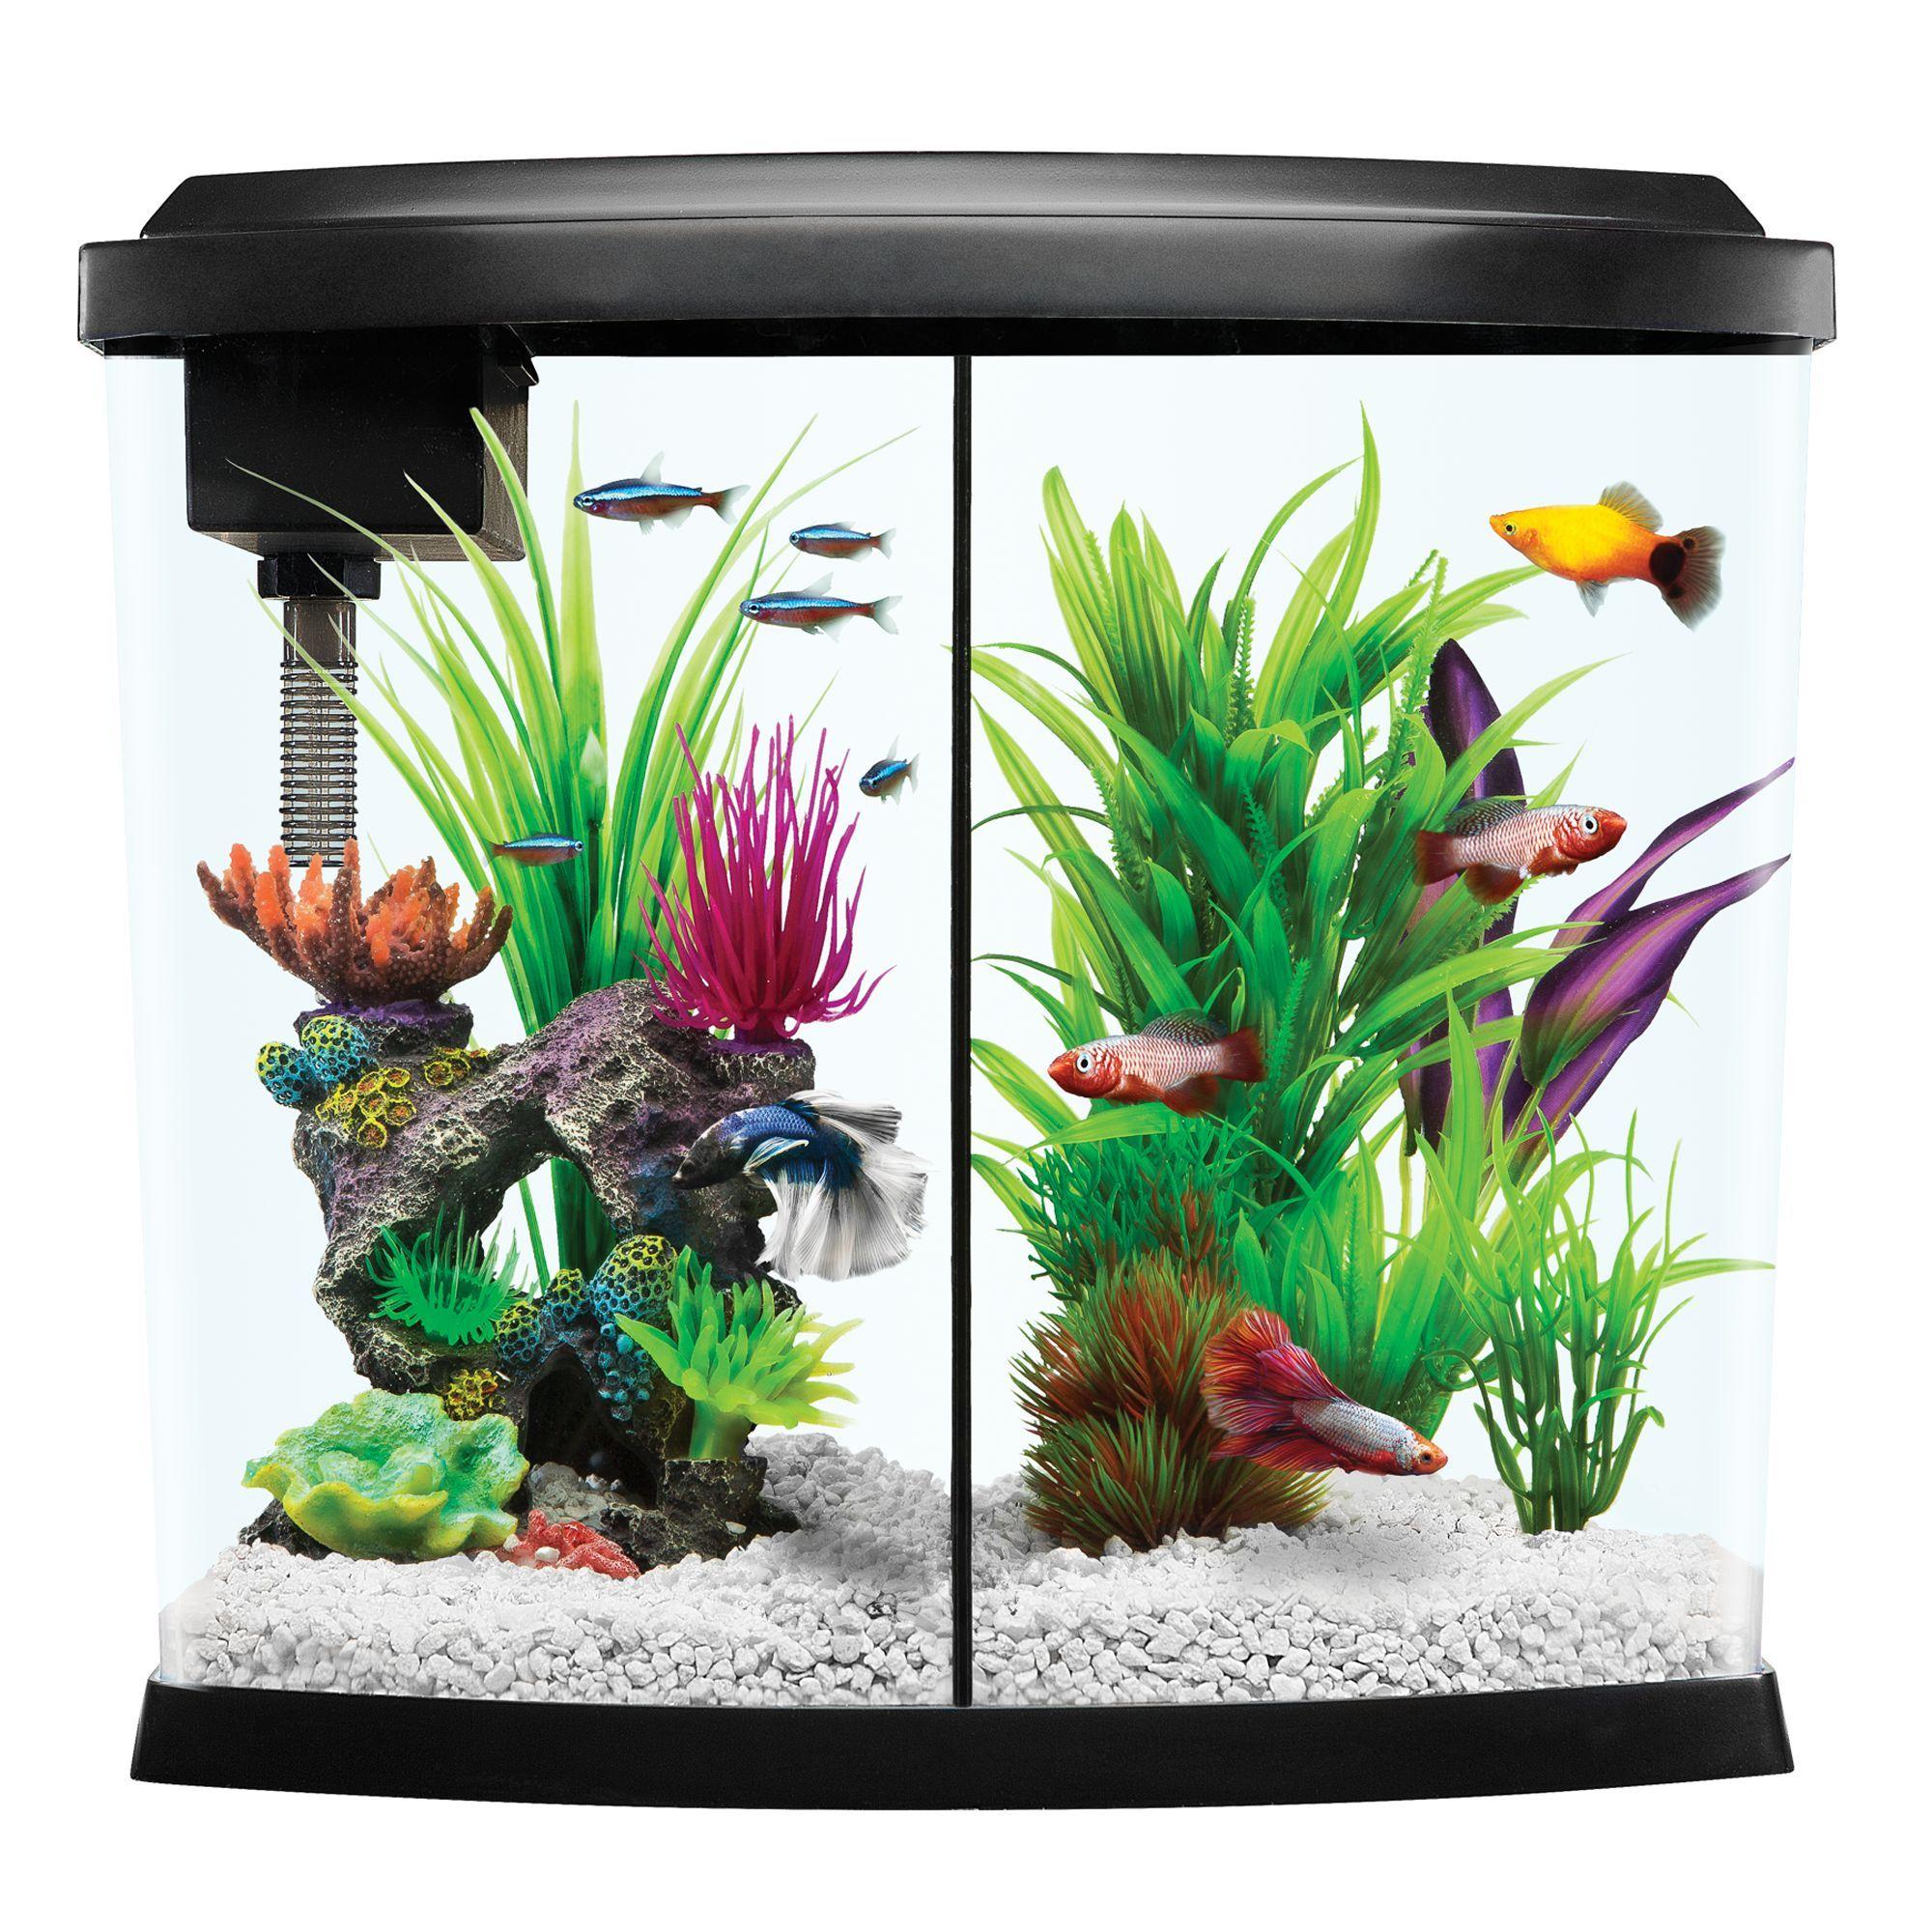 Top Fin LiquidySplit Aquarium Kit size 5 Gal, gravel